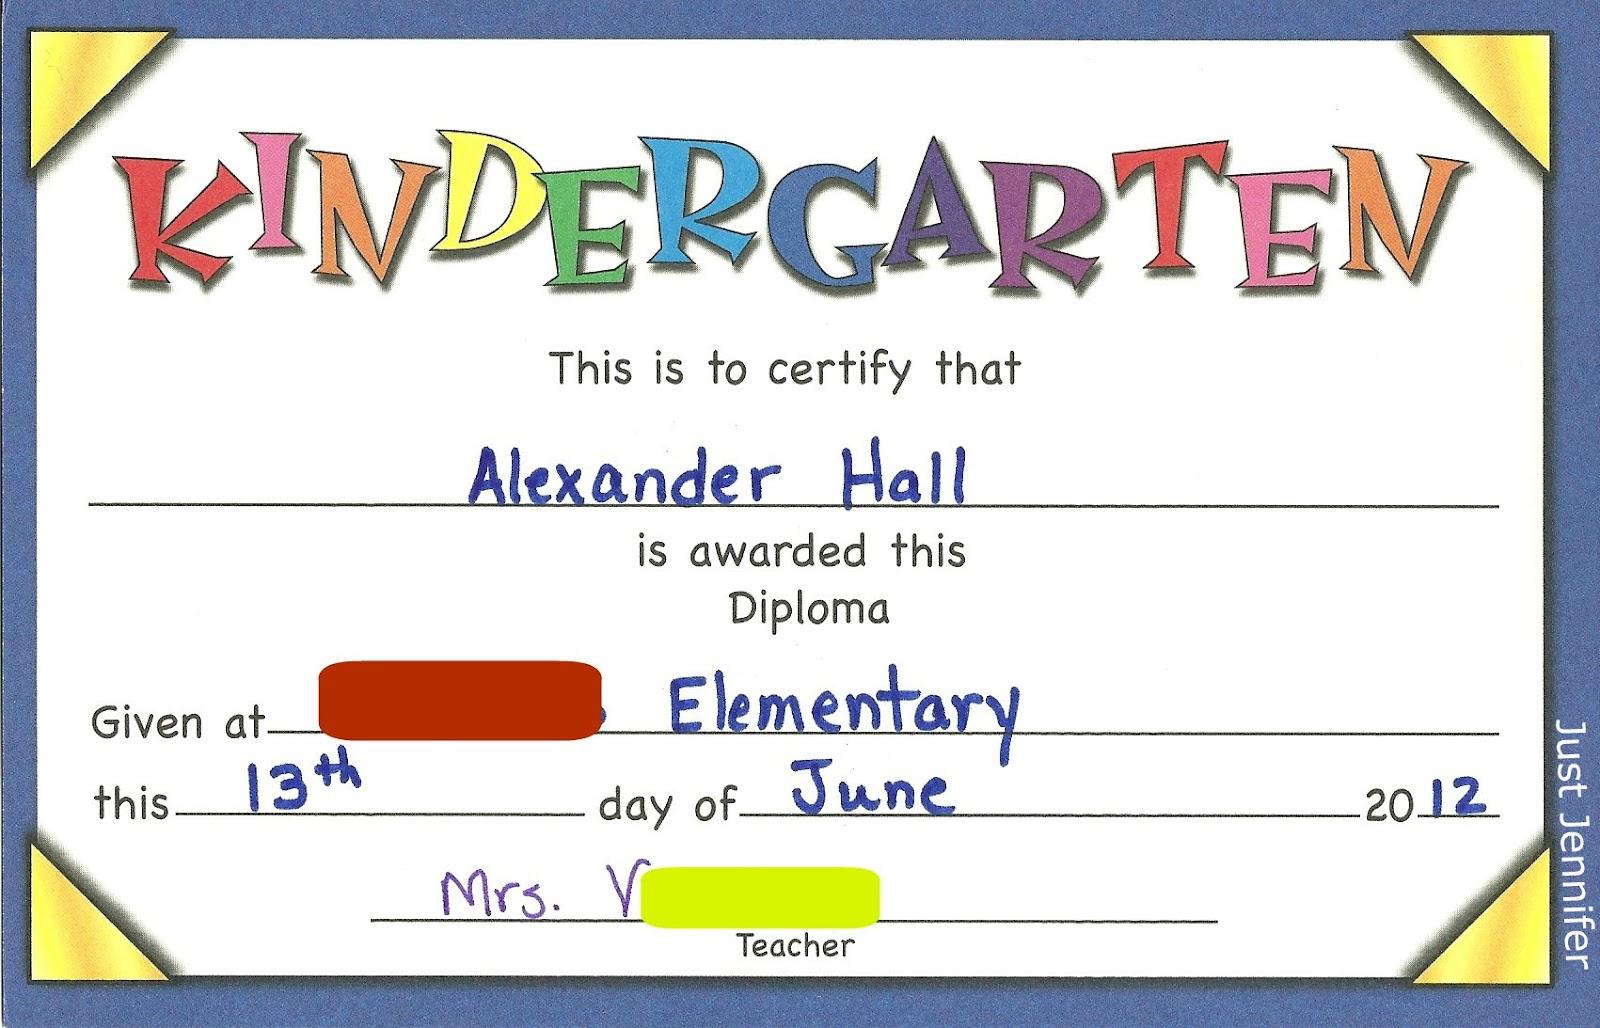 100 kindergarten graduation certificate template templates kindergarten graduation certificate template dancing in the rain june 2012 yadclub Gallery